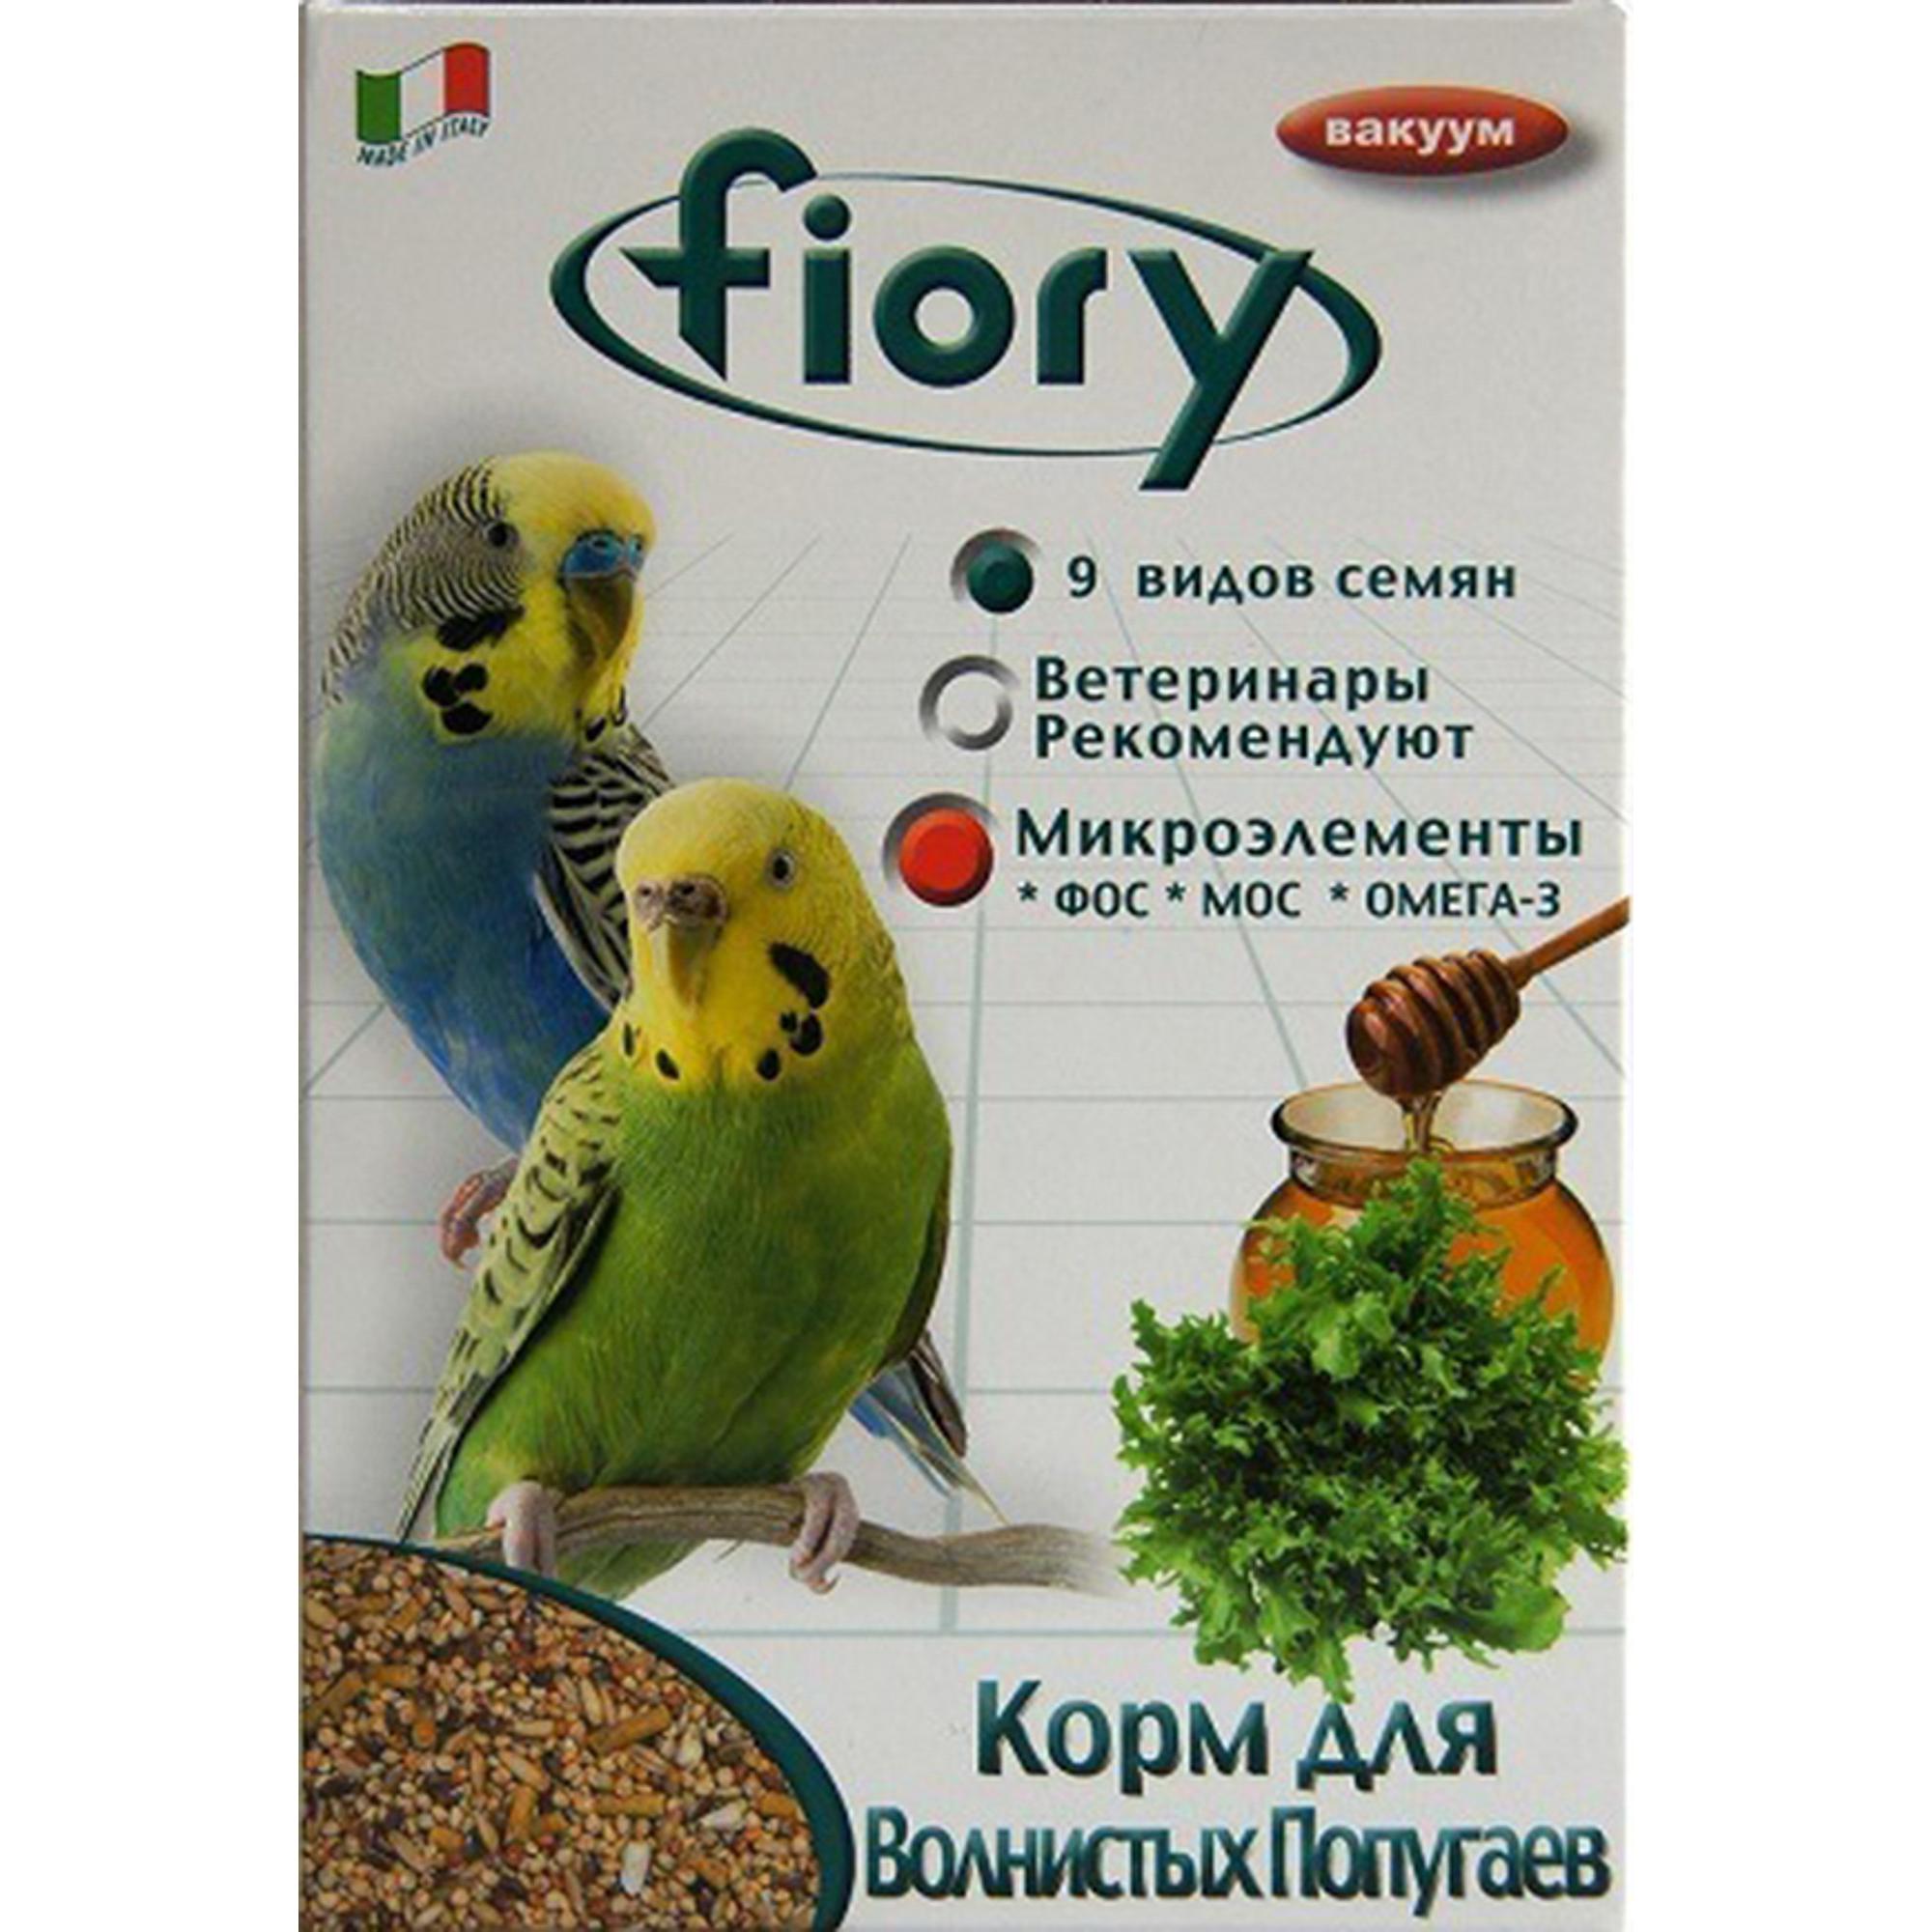 Фото - Корм для птиц FIORY Parrocchetti Africa для средних попугаев 800г fiory fiory корм для средних попугаев parrocchetti african